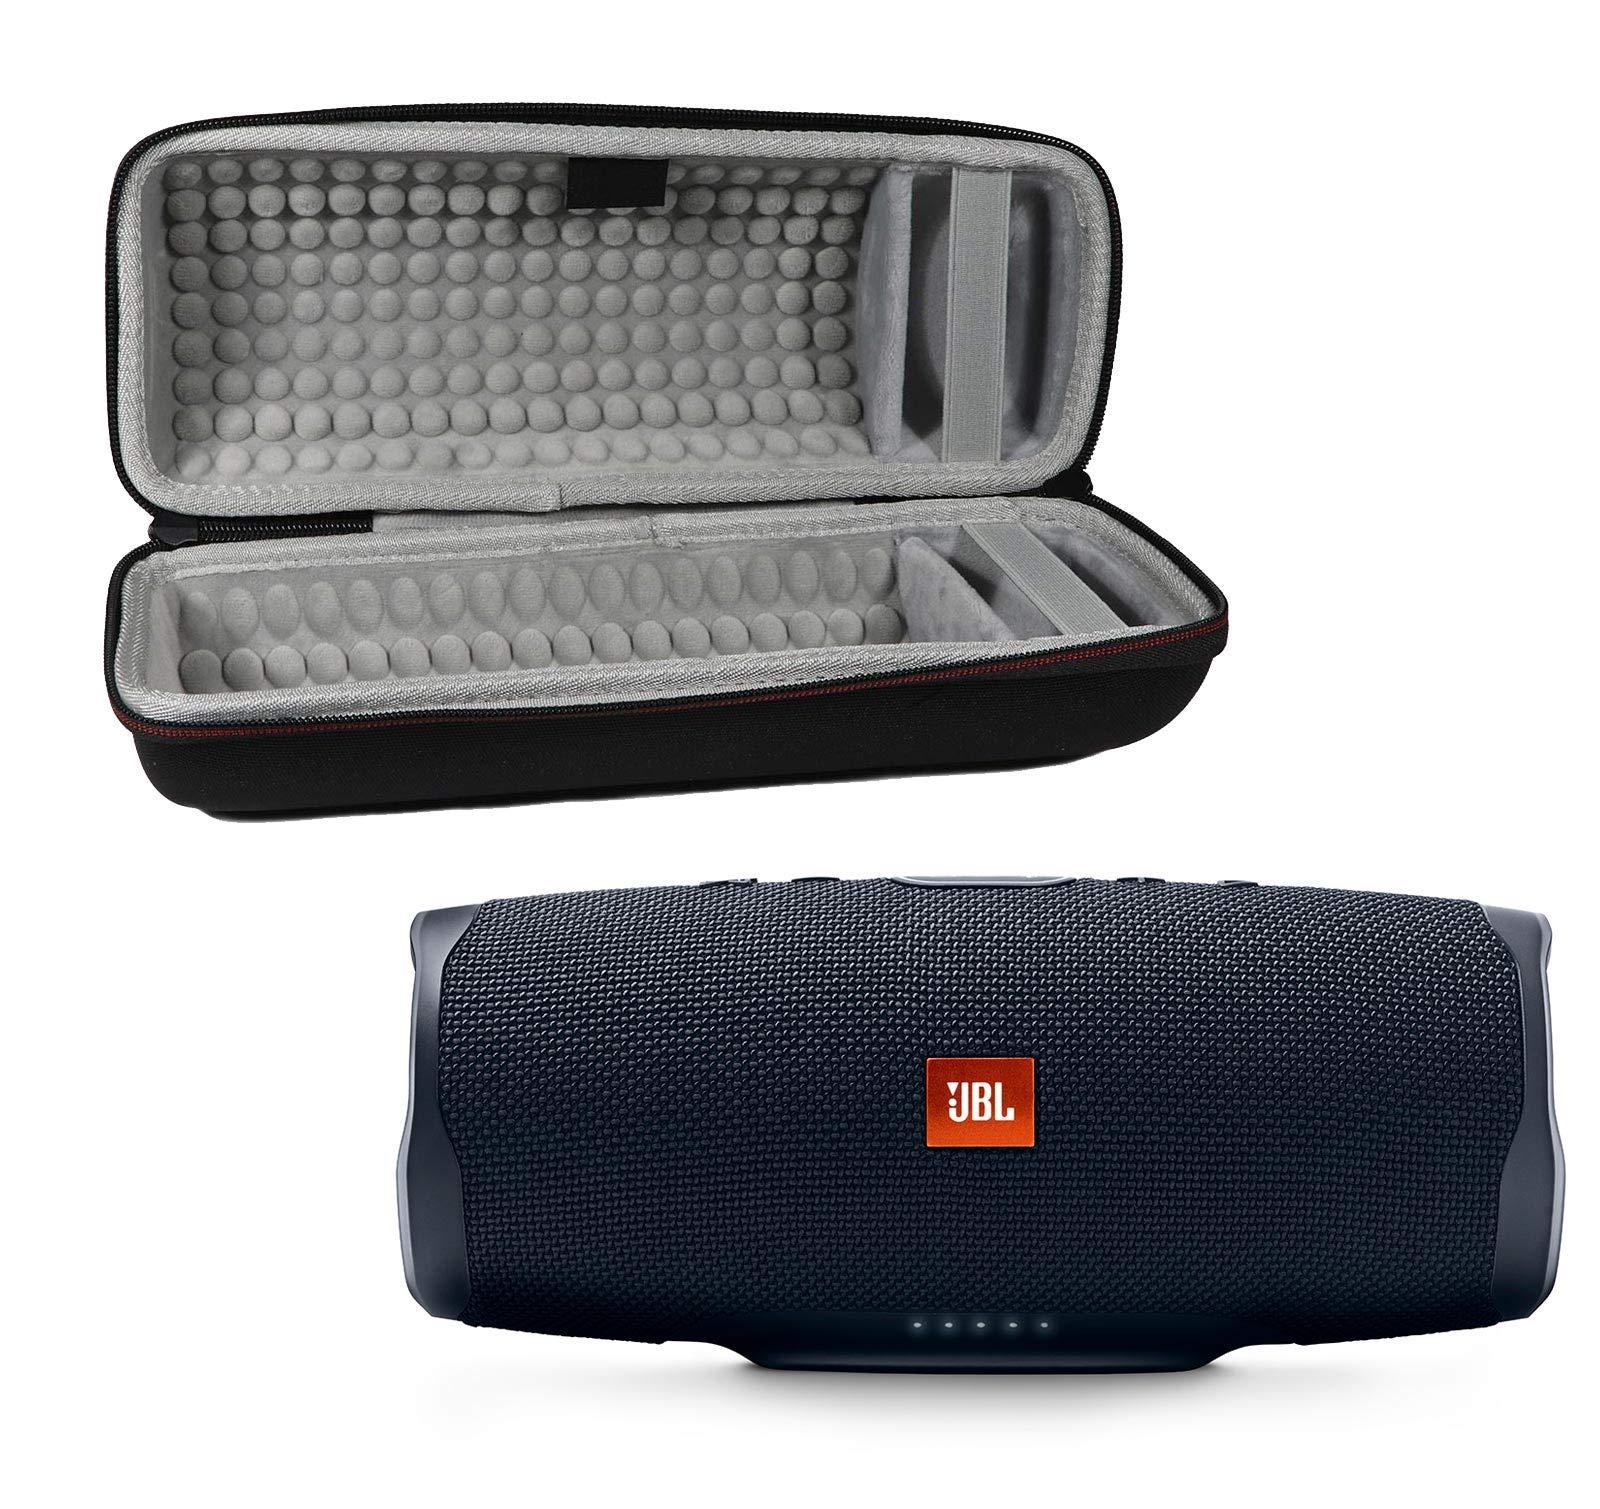 JBL Charge 4 Waterproof Wireless Bluetooth Speaker Bundle with Portable Hard Case - Black by JBL